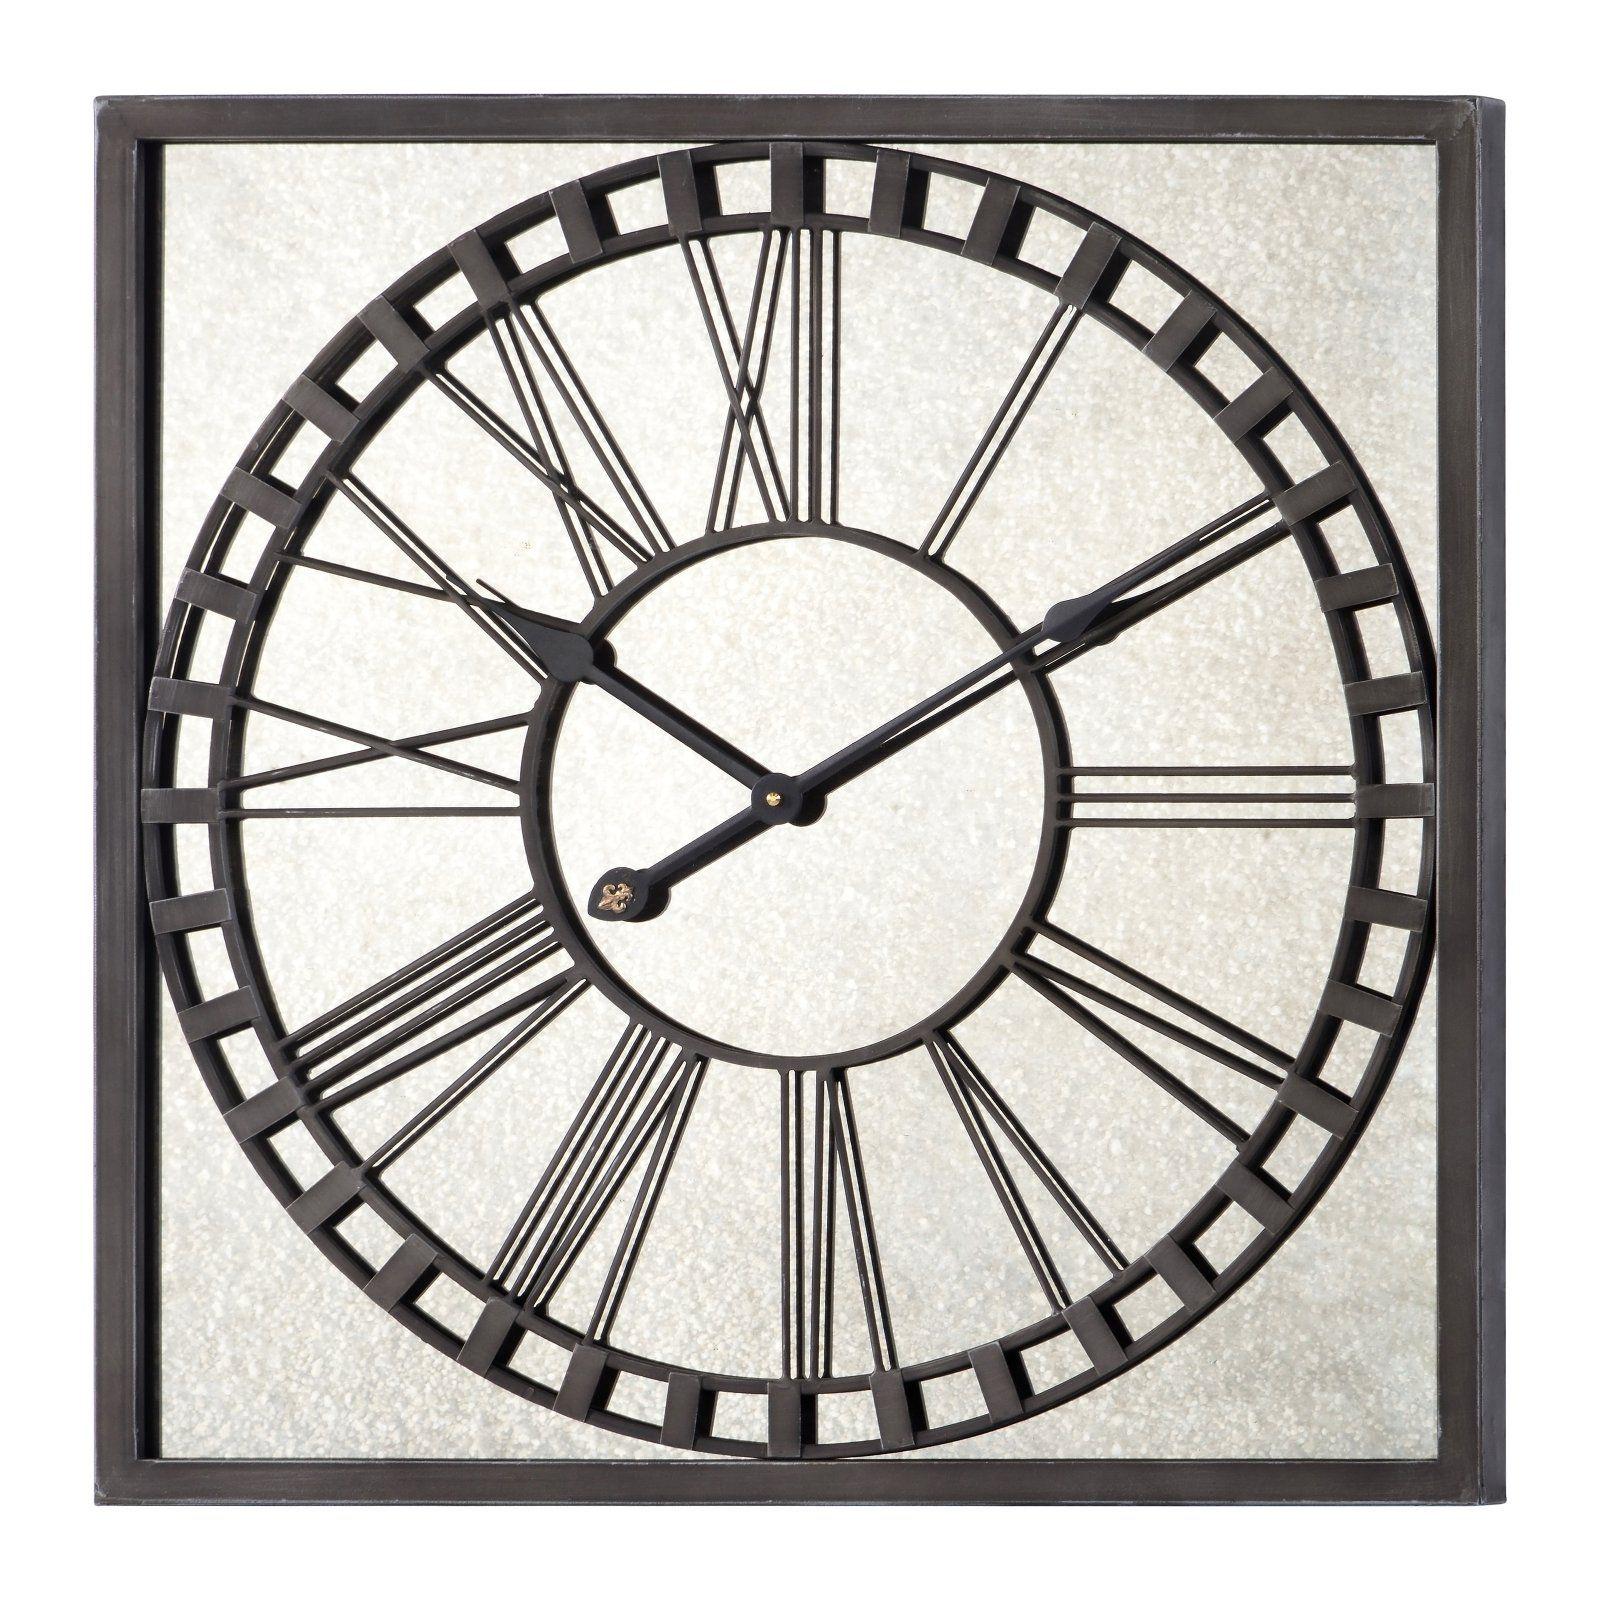 Pin By Eliana Brown On Sara S Clock Wall Wall Clock Metal Wall Clock Square Clocks